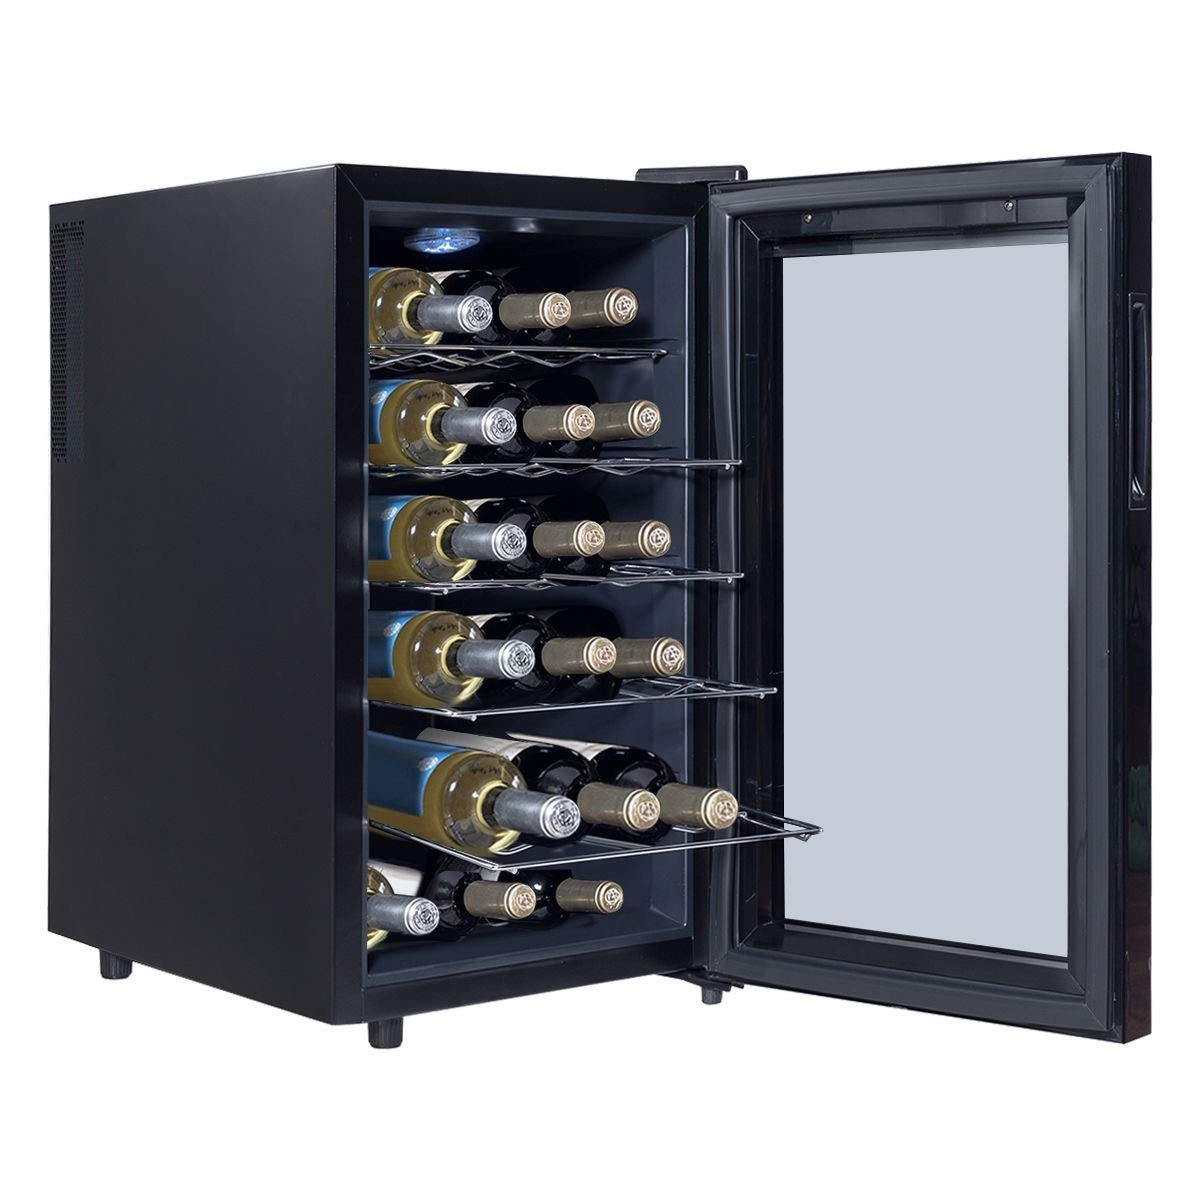 18 Bottle Freestanding Thermoelectric Wine Cooler New Perfect Beautiful Classic Elegant Useful CHOOSEandBUY